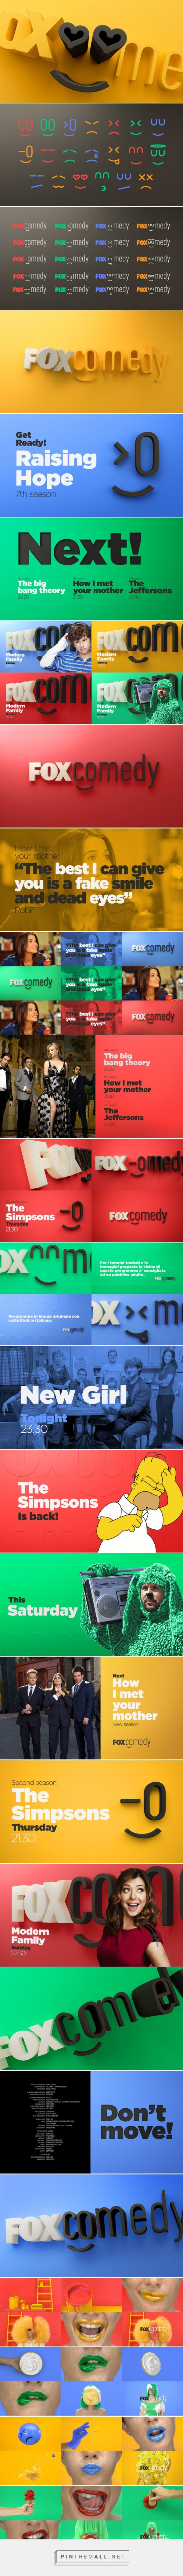 Fox Comedy | Tv Channel Branding - created via https://pinthemall.net